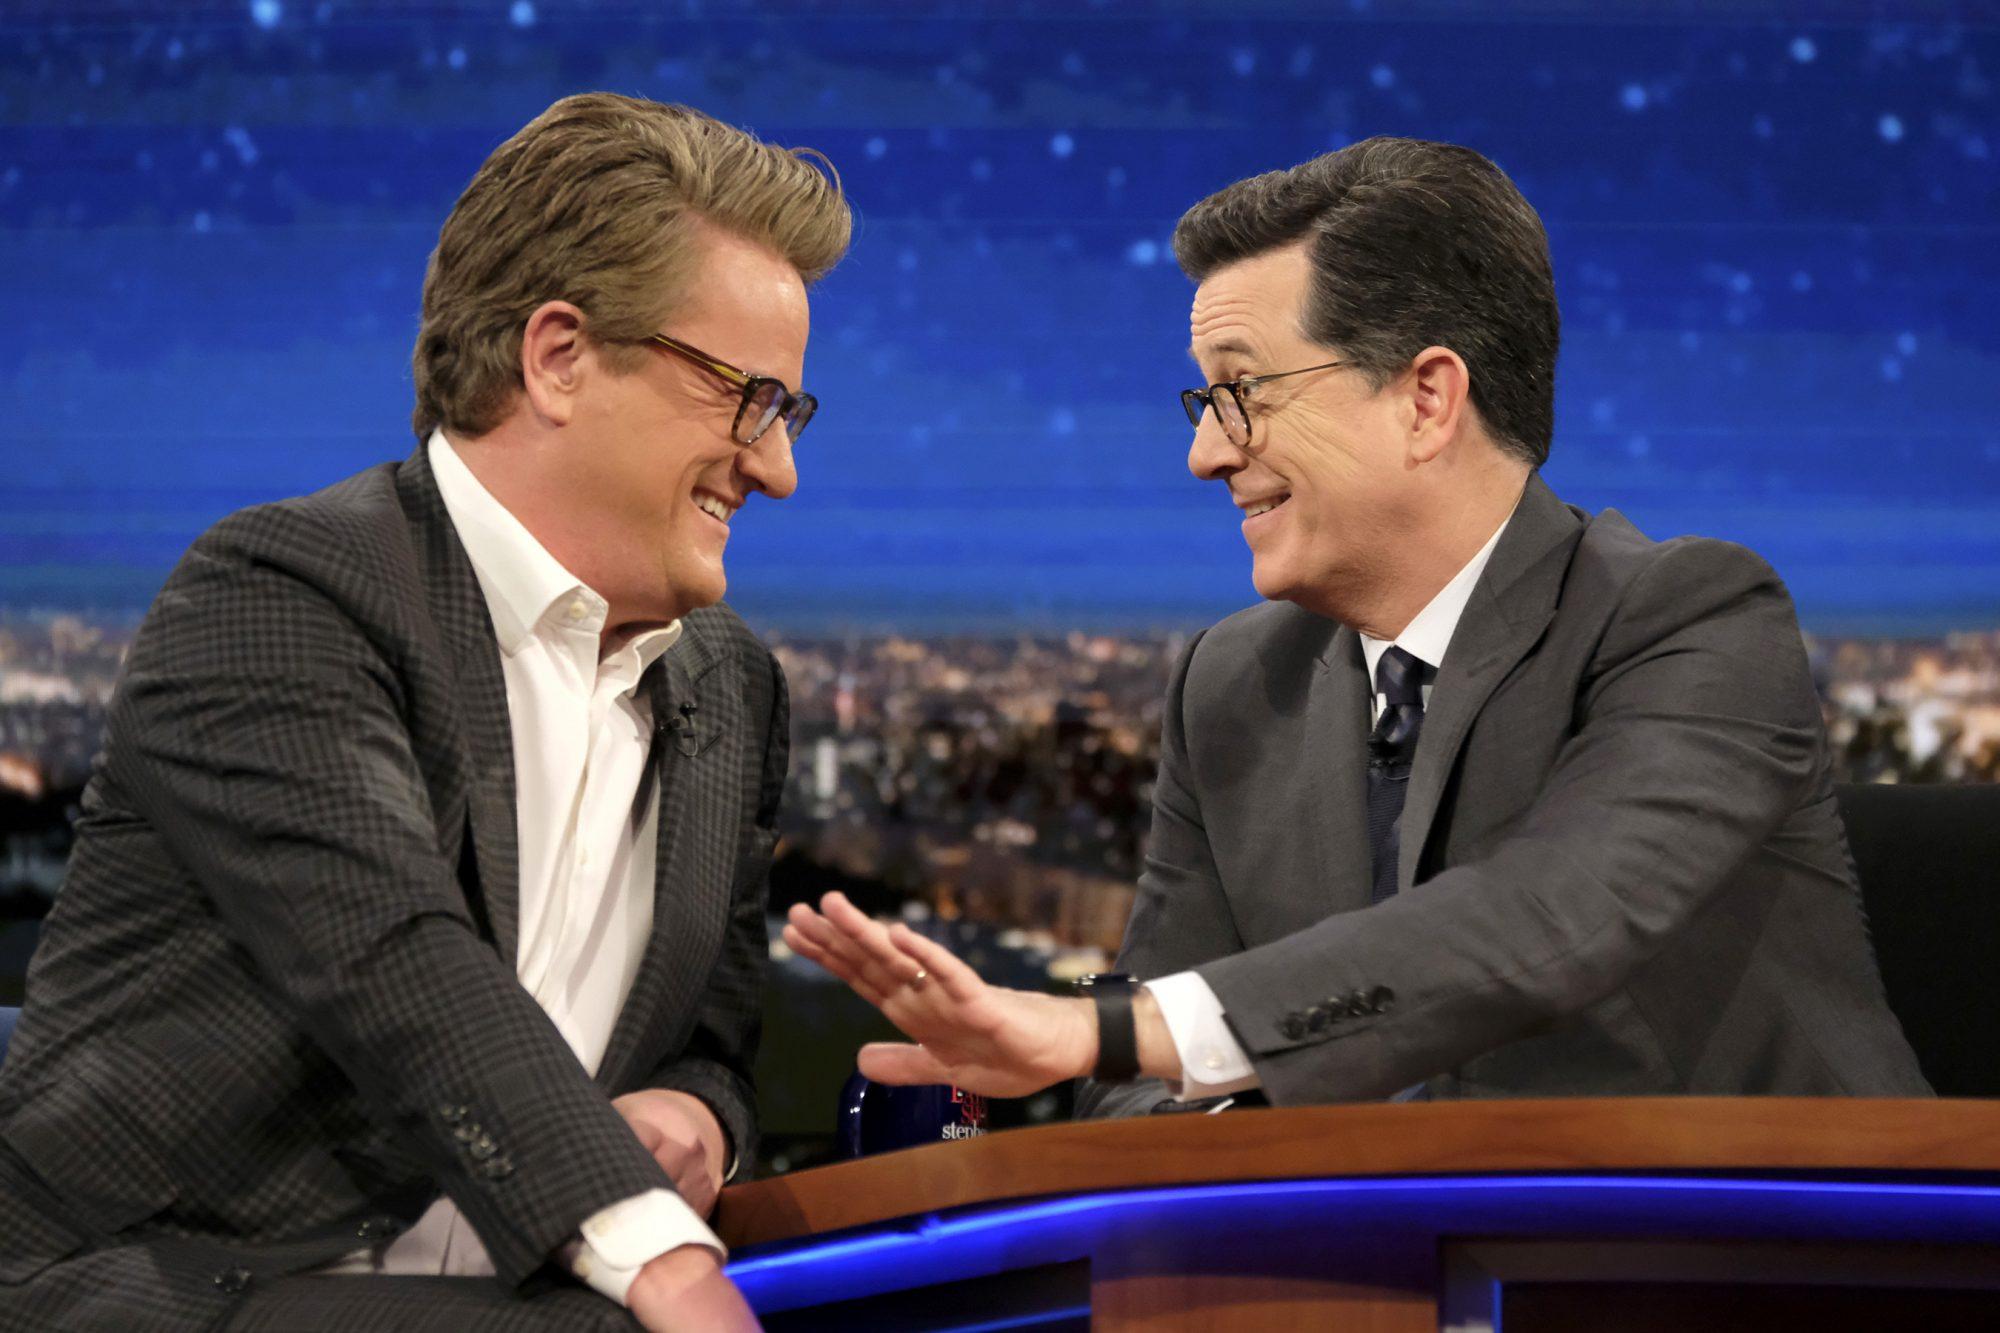 Stephen Colbert with Joe Scarborough